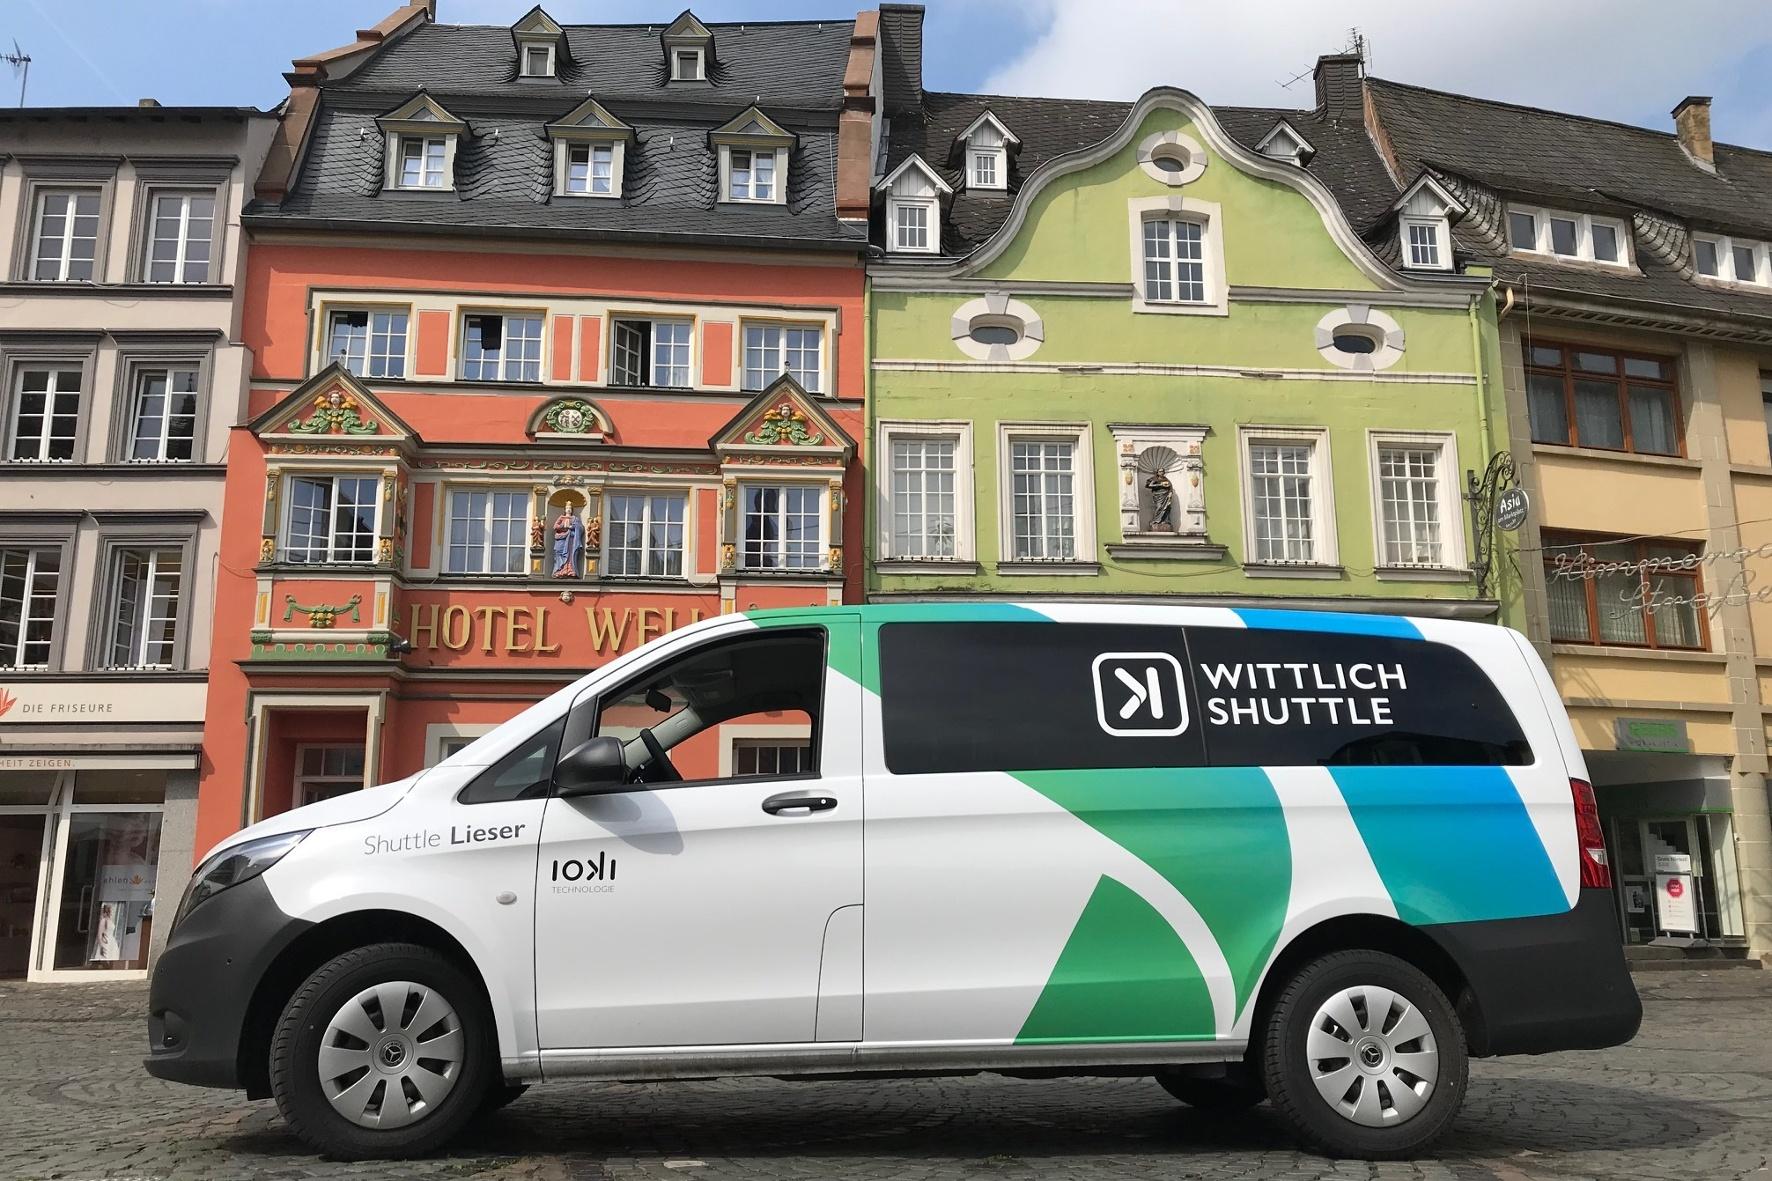 Neuer Ruf-Bus-Service ergänzt per App bestehende Verkehrsinfrastrukturen